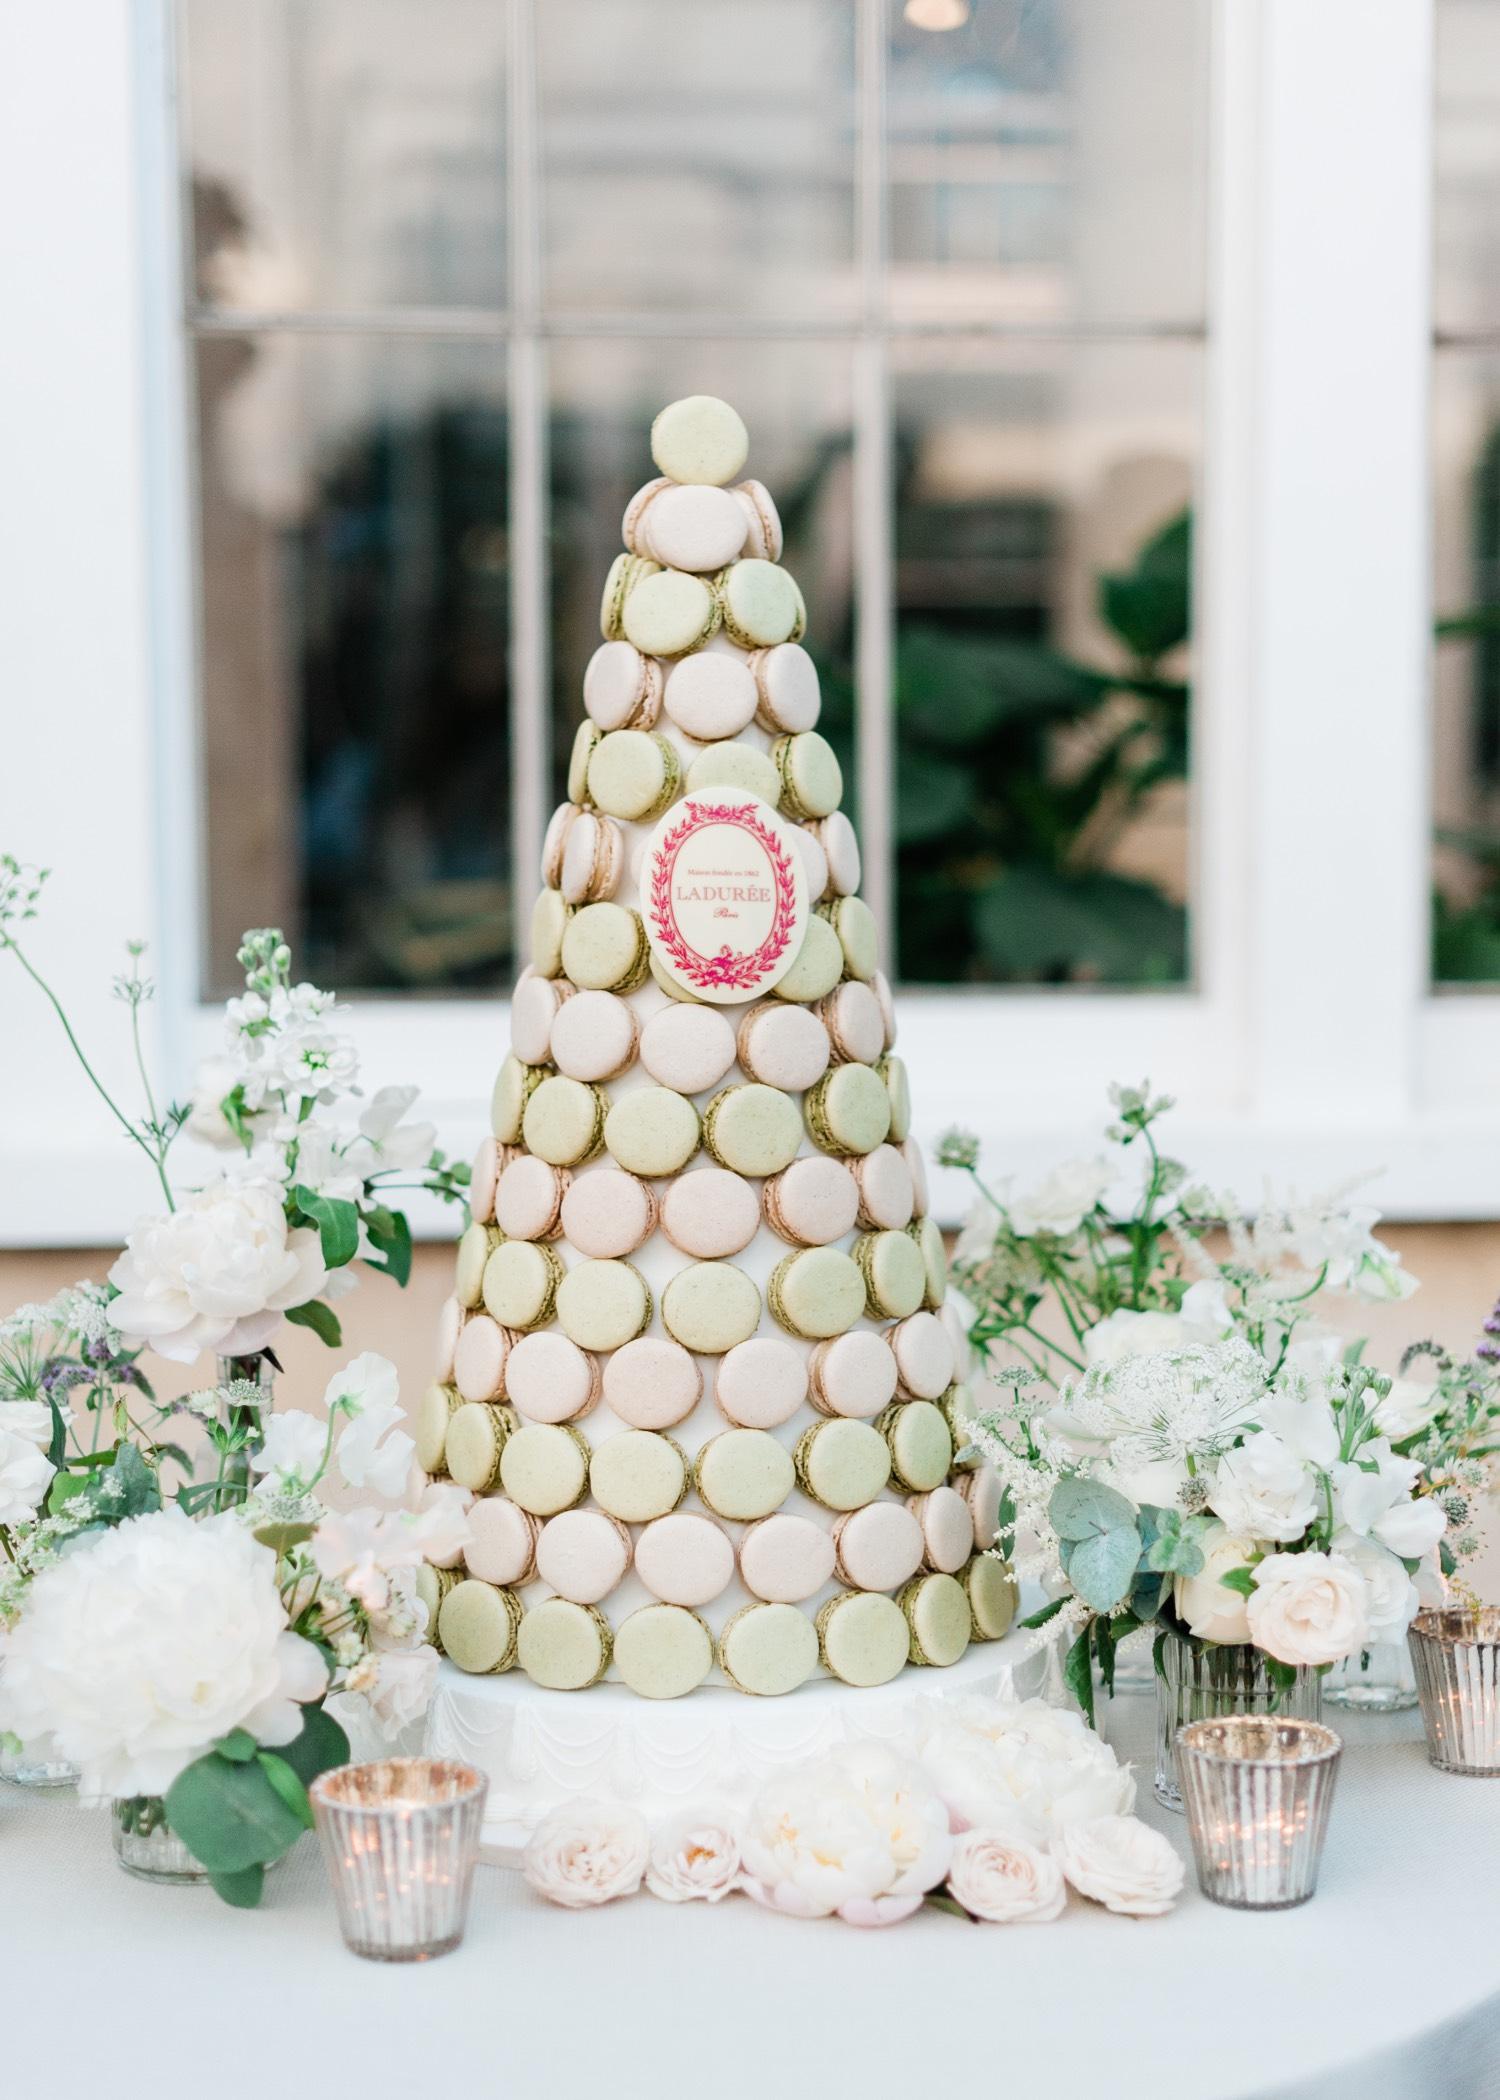 Littleton-Rose-Syon-House-London-Wedding-Planner-macaroon-tower-laduree.jpg